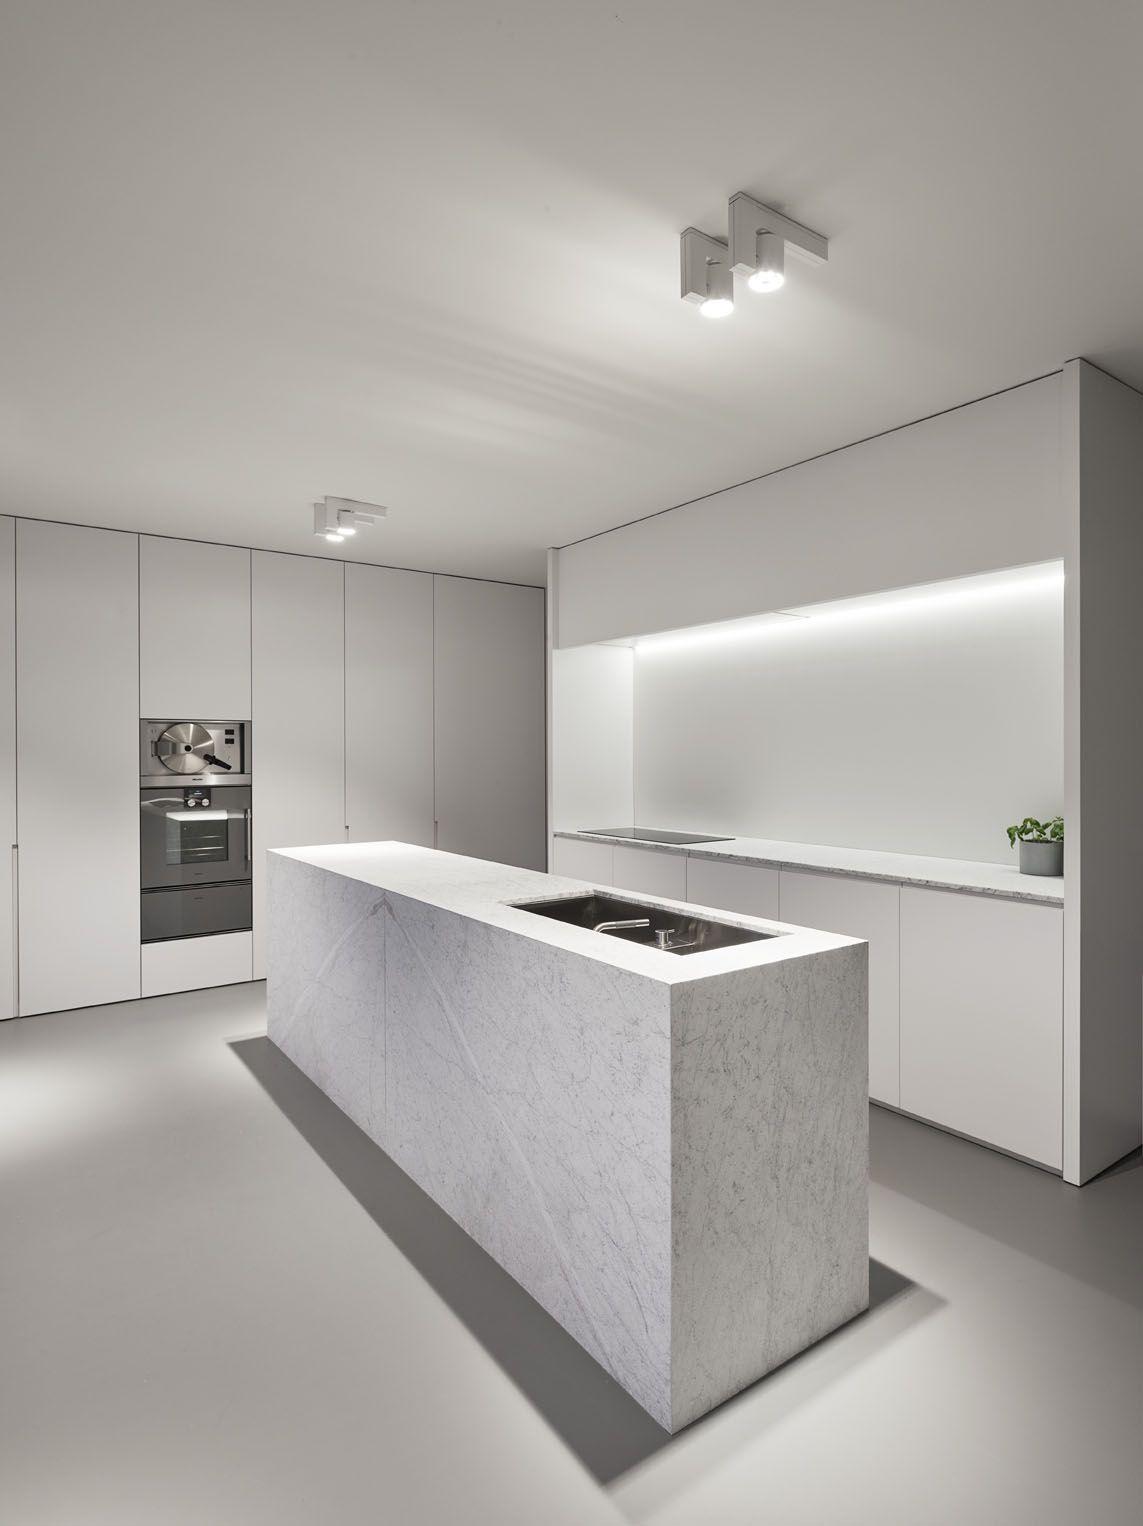 White marble kitchen minimalist modern spotlights kitchen island LED ...